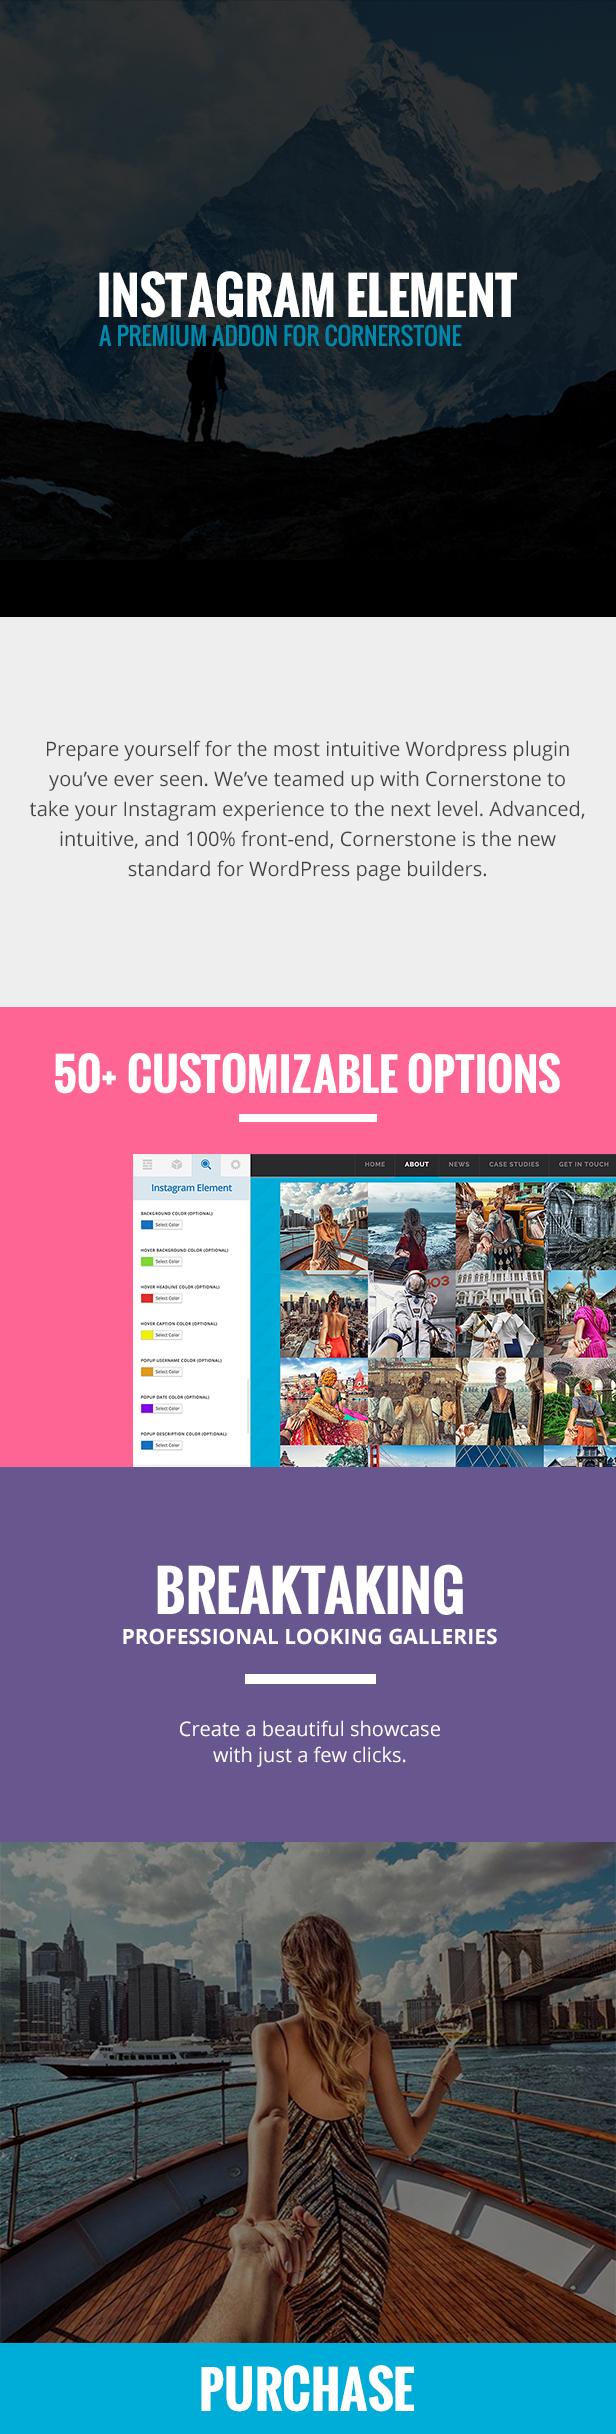 Instagram Element - Cornerstone Element for WordPress - 2